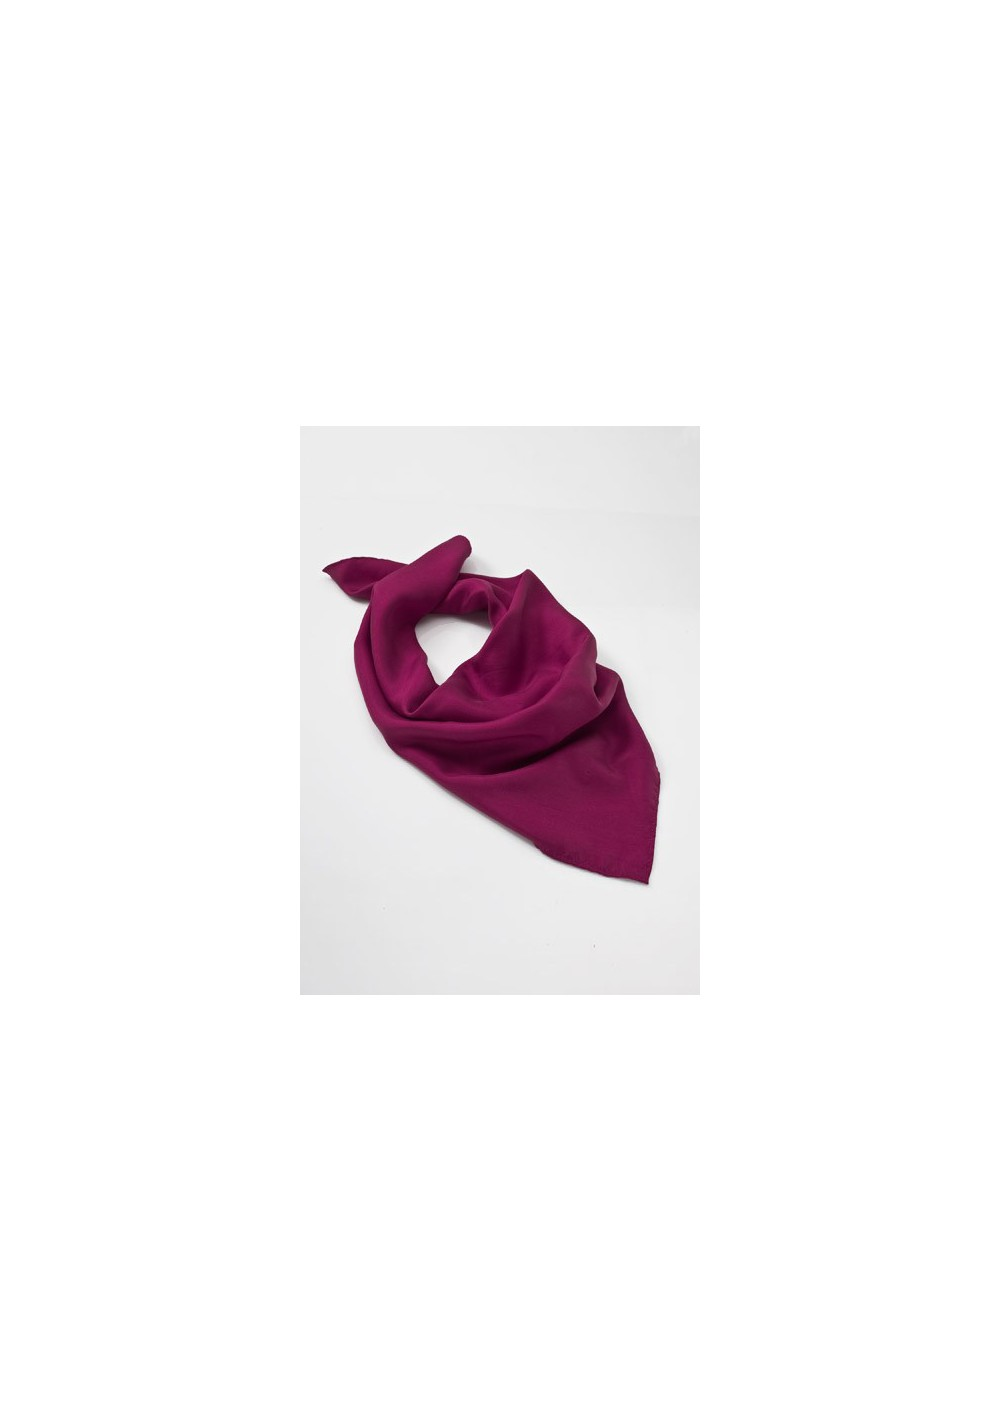 Women's Silk Scarf in Fuchsia Pink